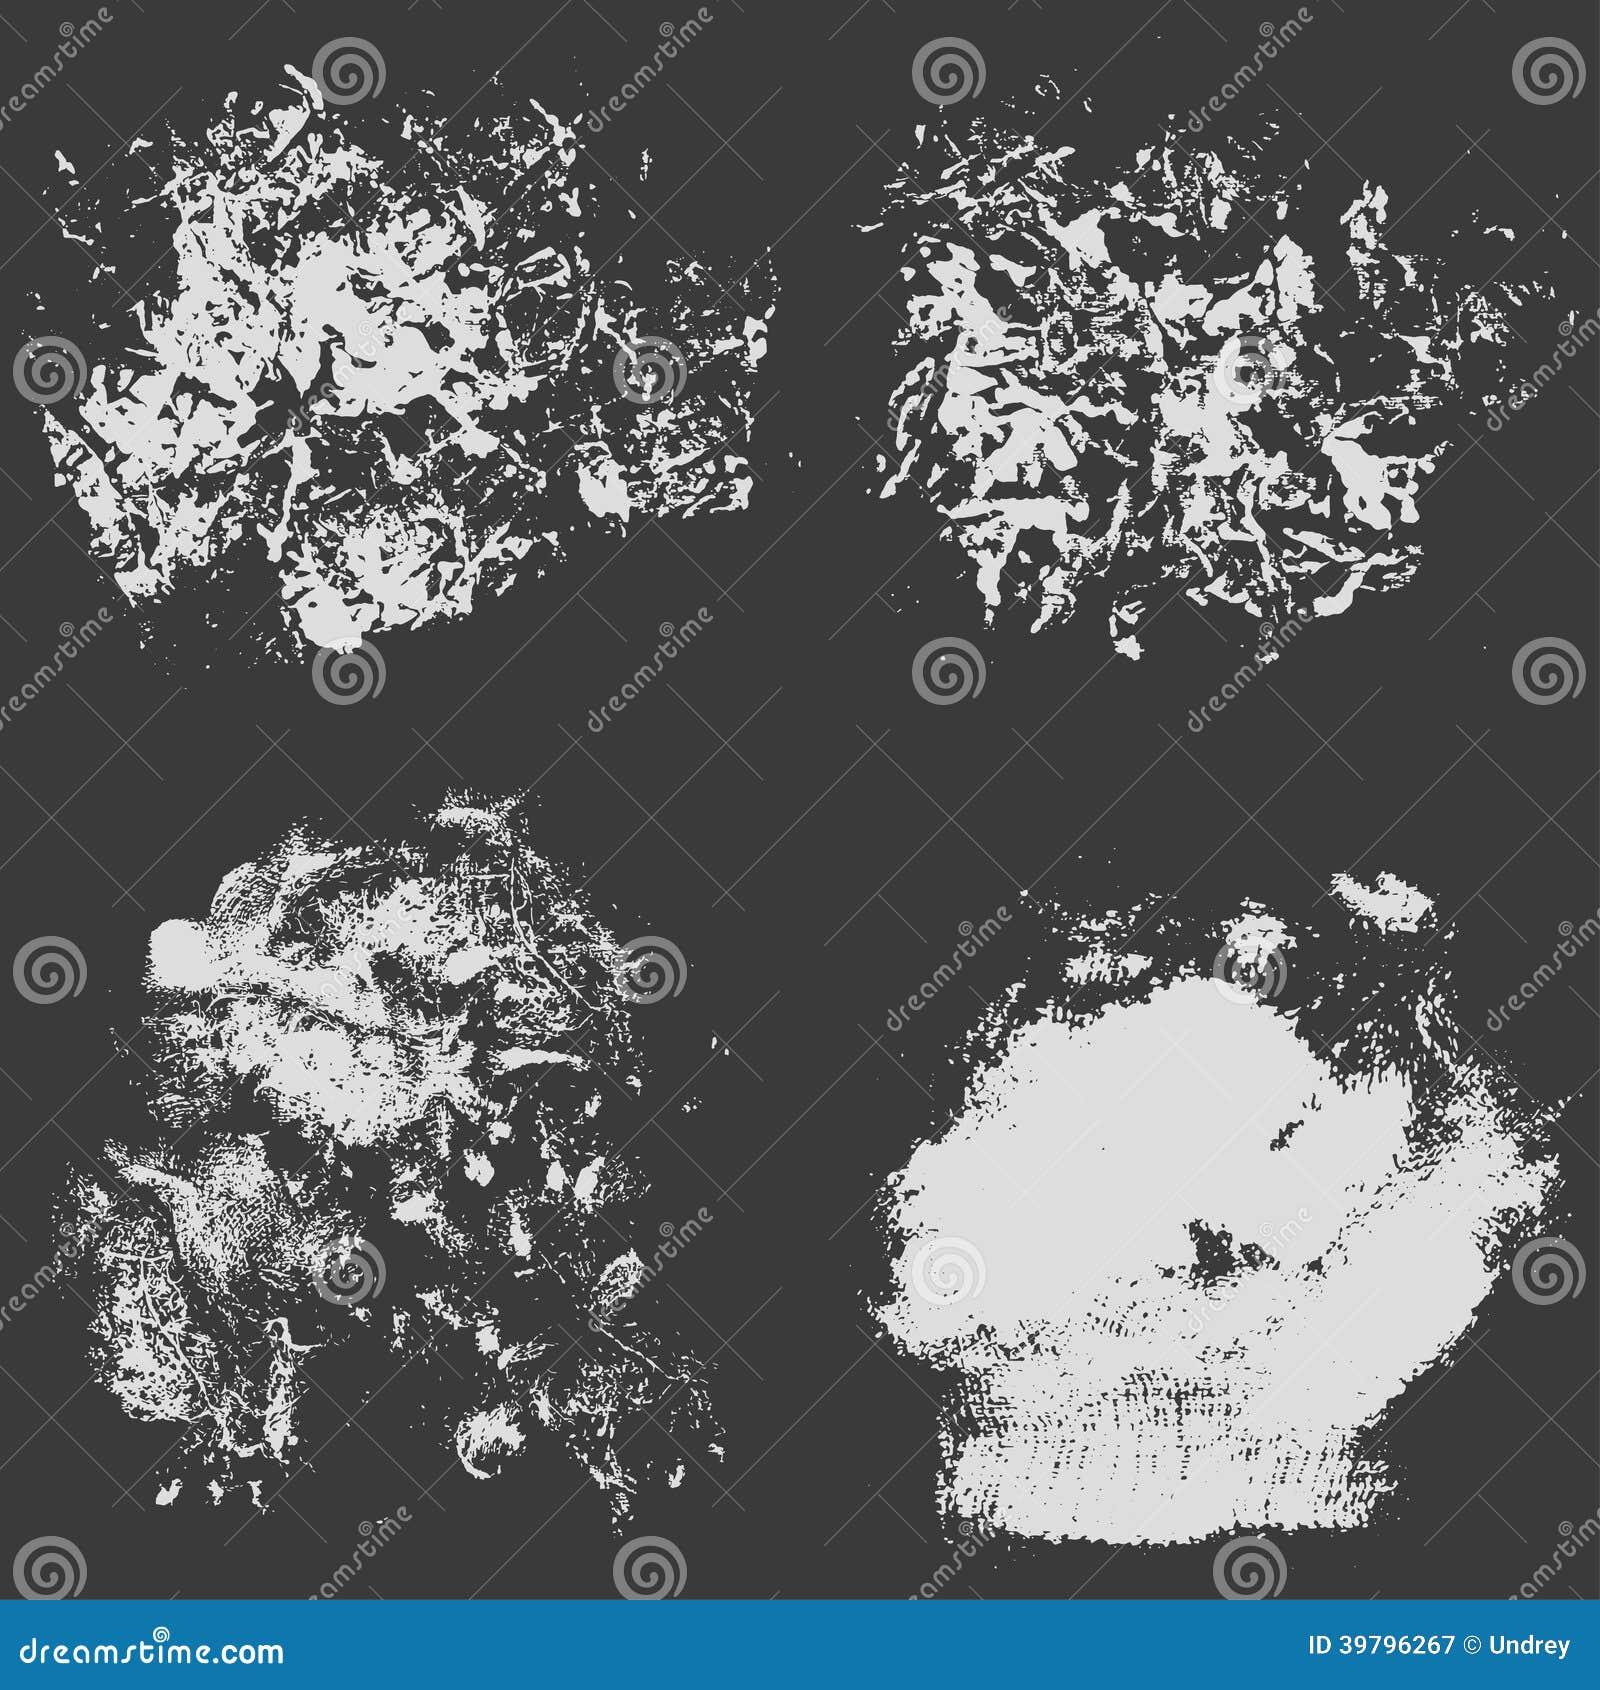 Rough Texture Background: Rough Grungy Background. Dark Textured Surface. Vector